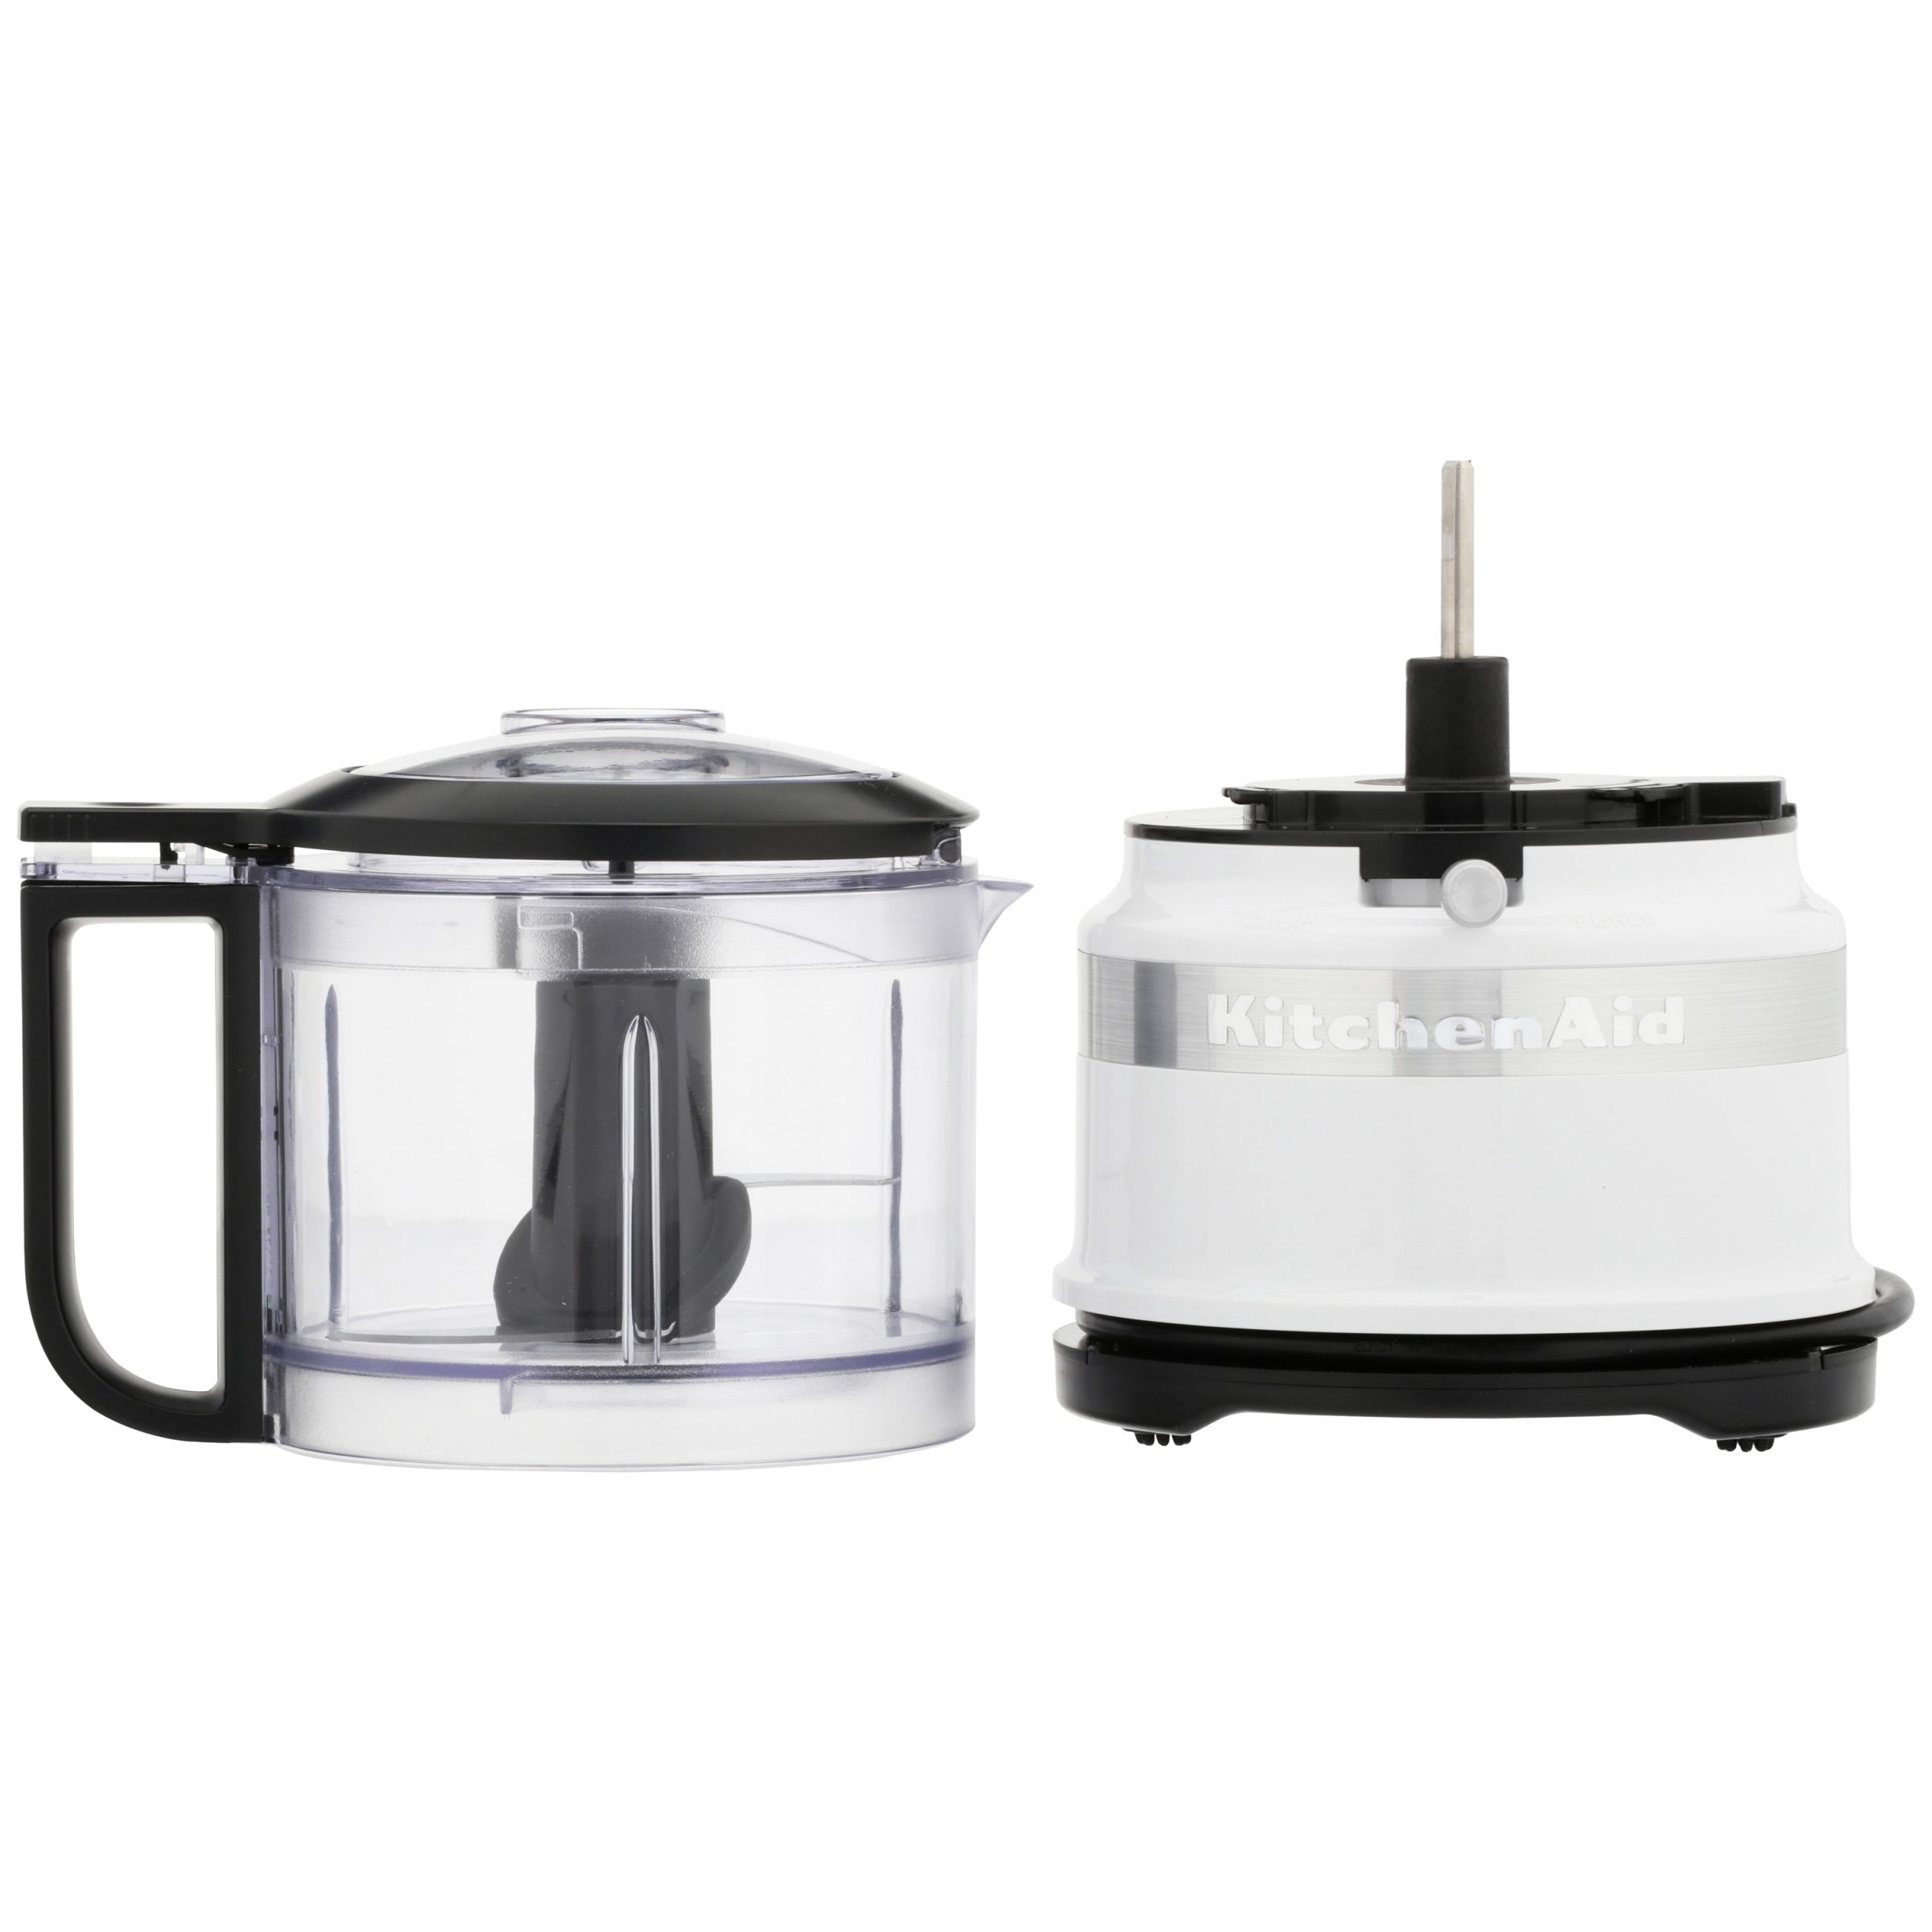 KitchenAid® 3.5 Cup Mini Food Processor, White (KFC3516WH) - Walmart.com